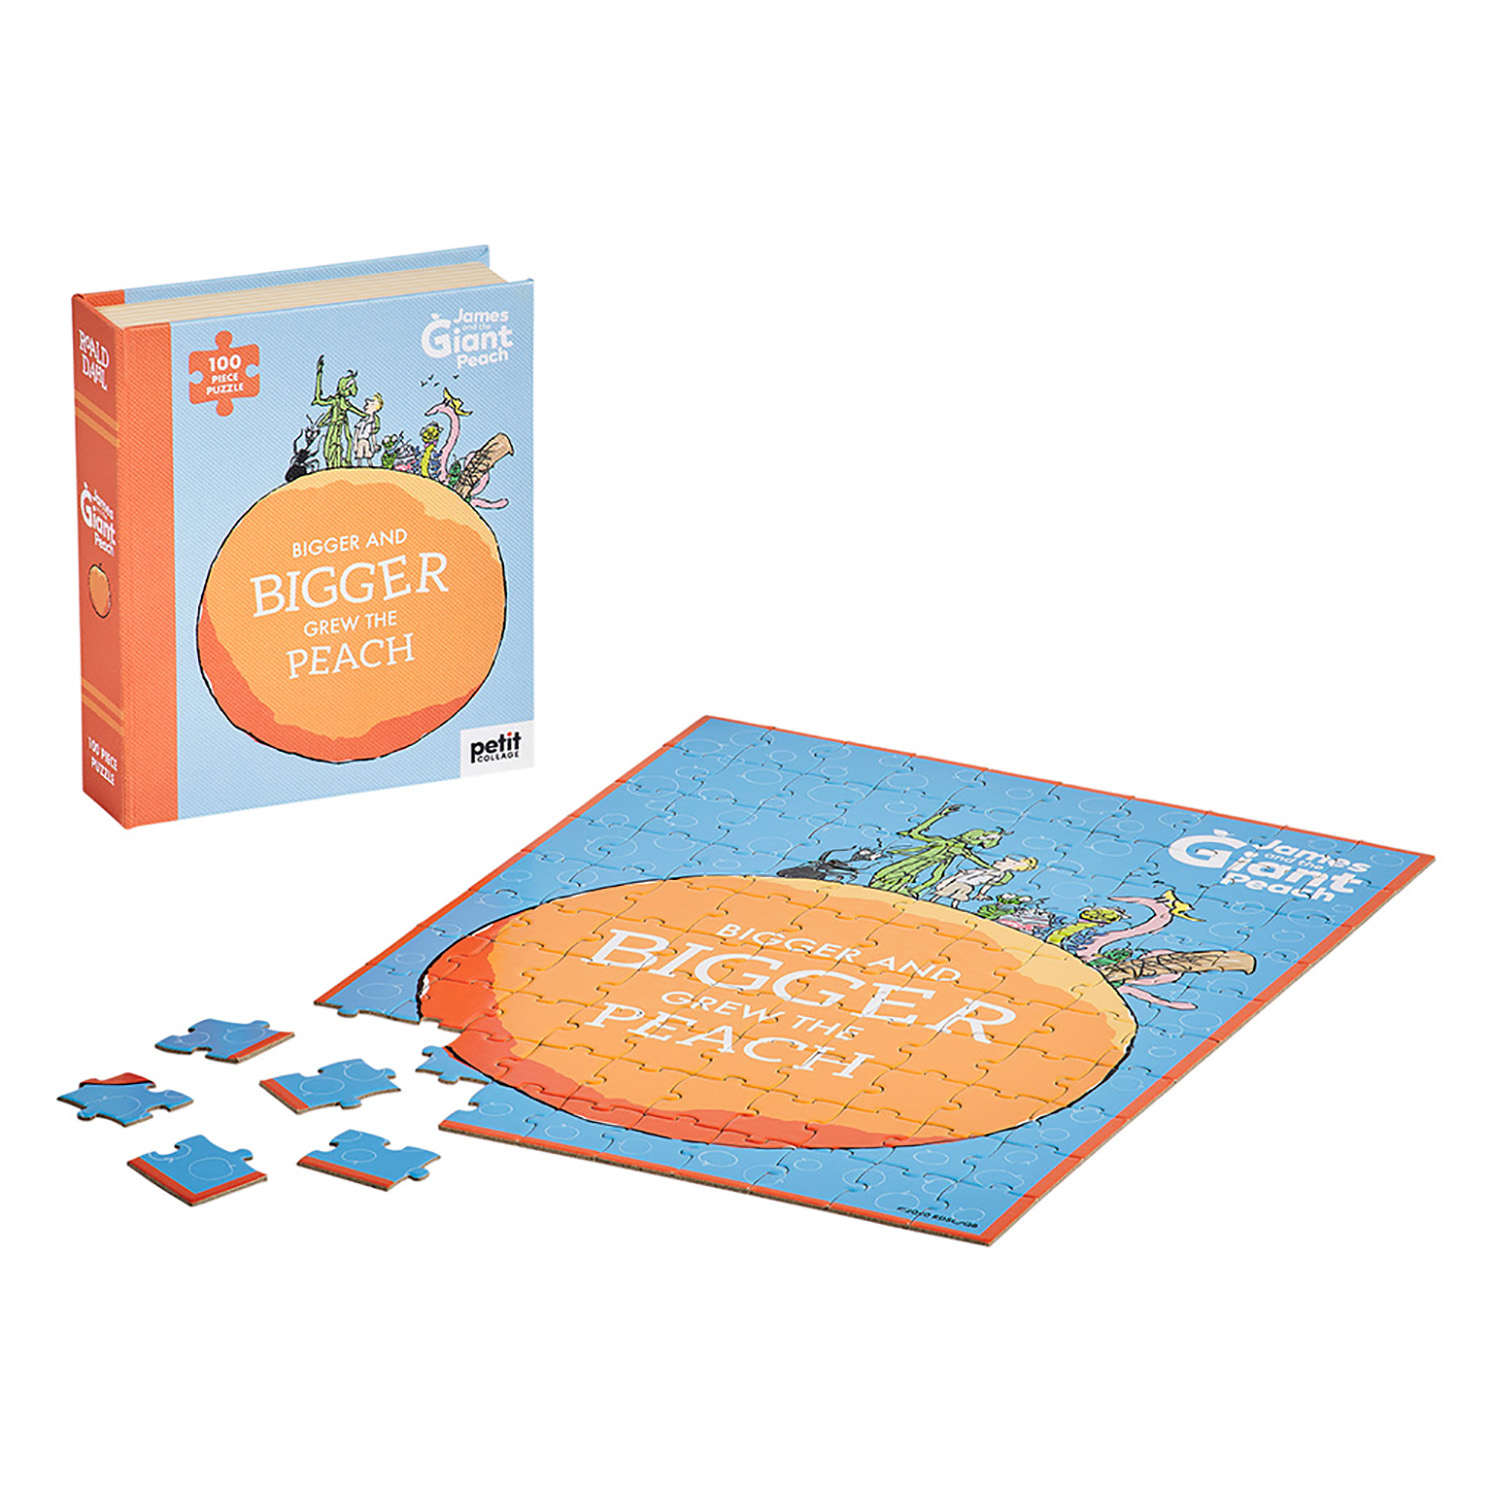 Petit Collage – Roald Dahl James & The Giant Peach 100-Piece Book Puzzle in Box